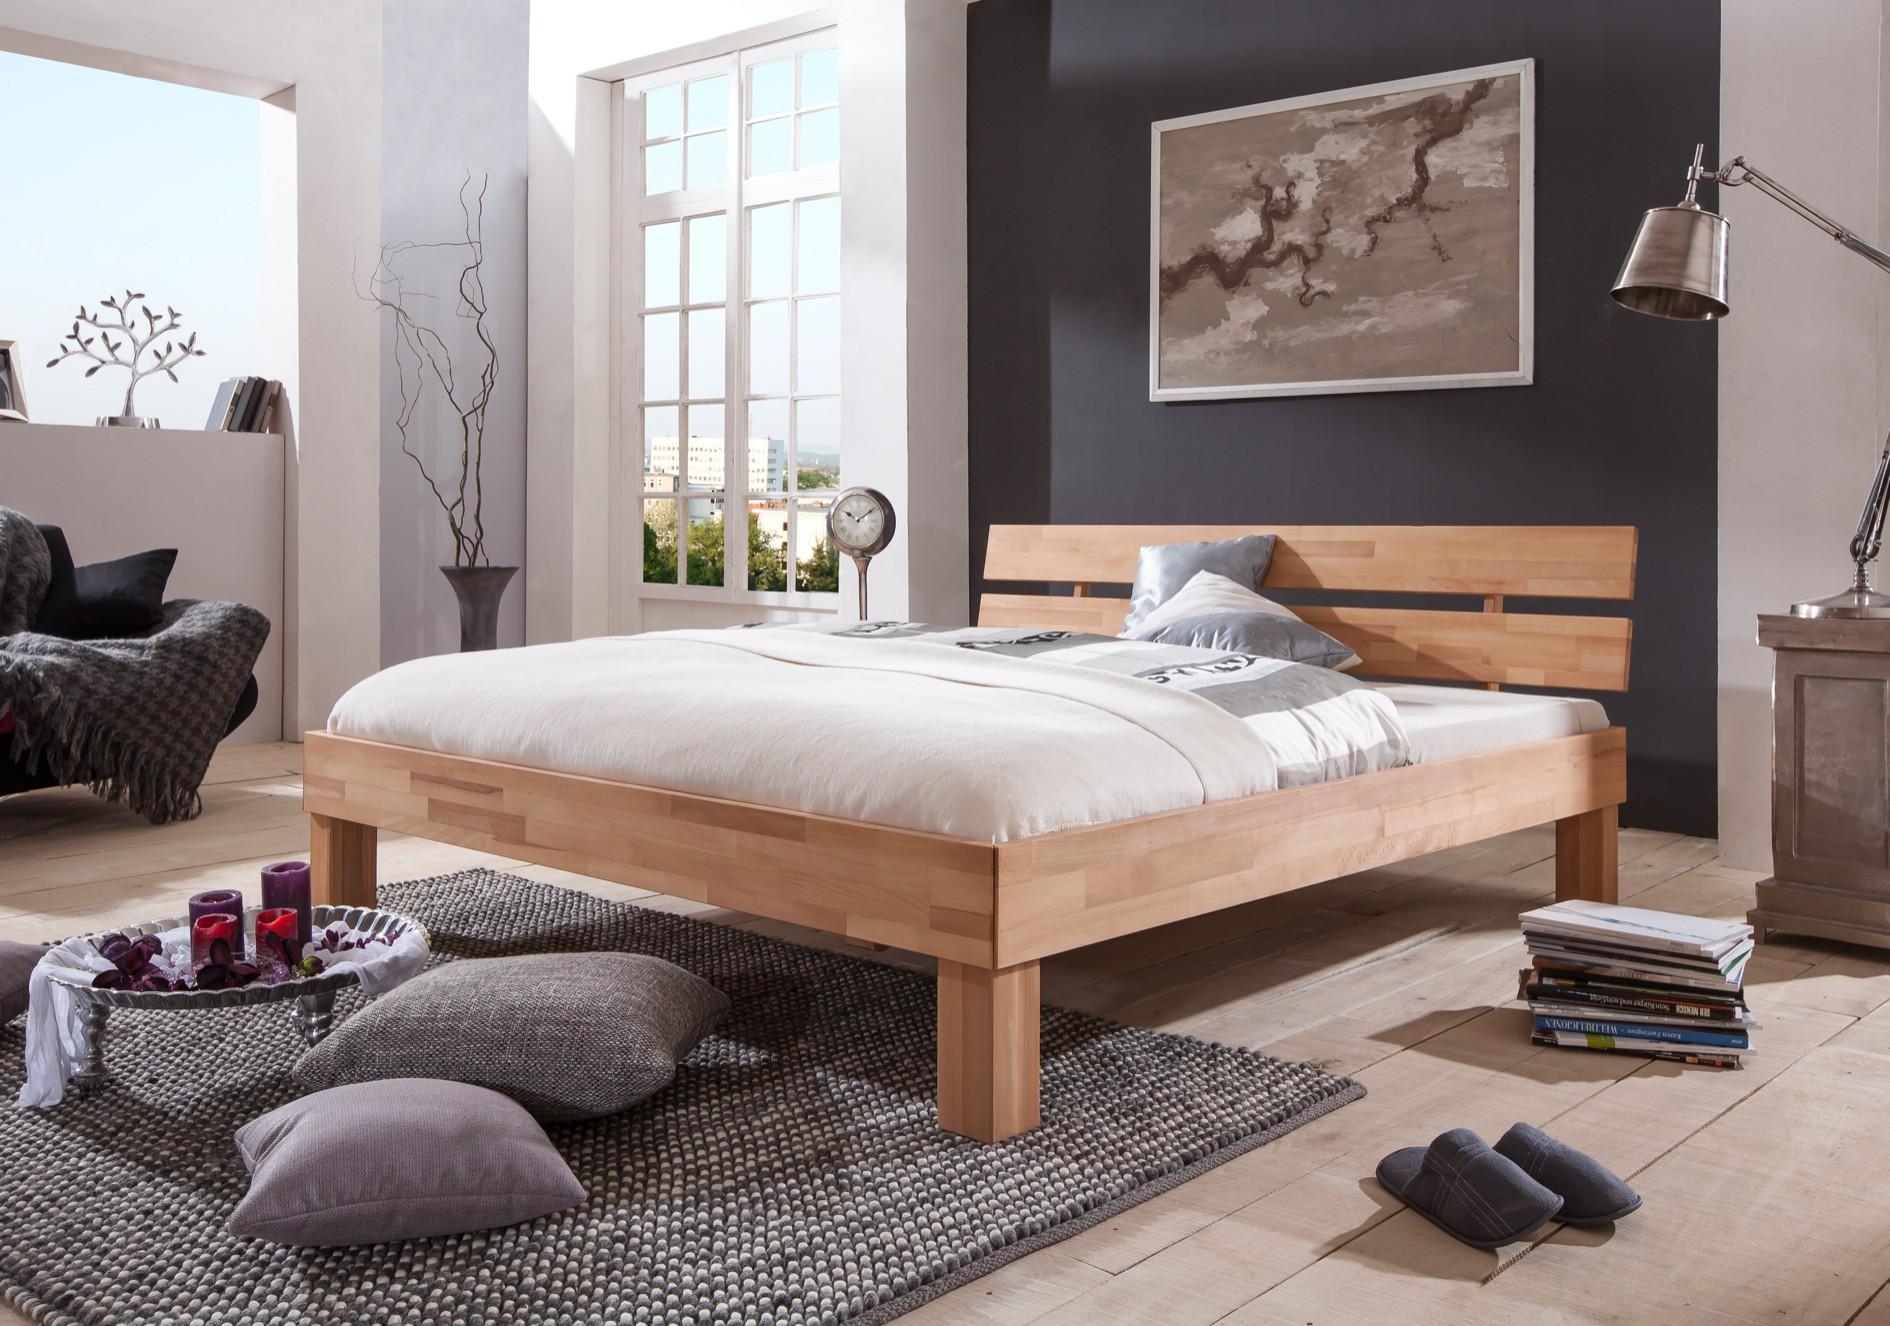 bett 180x200 bettkasten trendy polsterbett x with bett 180x200 bettkasten bett mit bettkasten. Black Bedroom Furniture Sets. Home Design Ideas